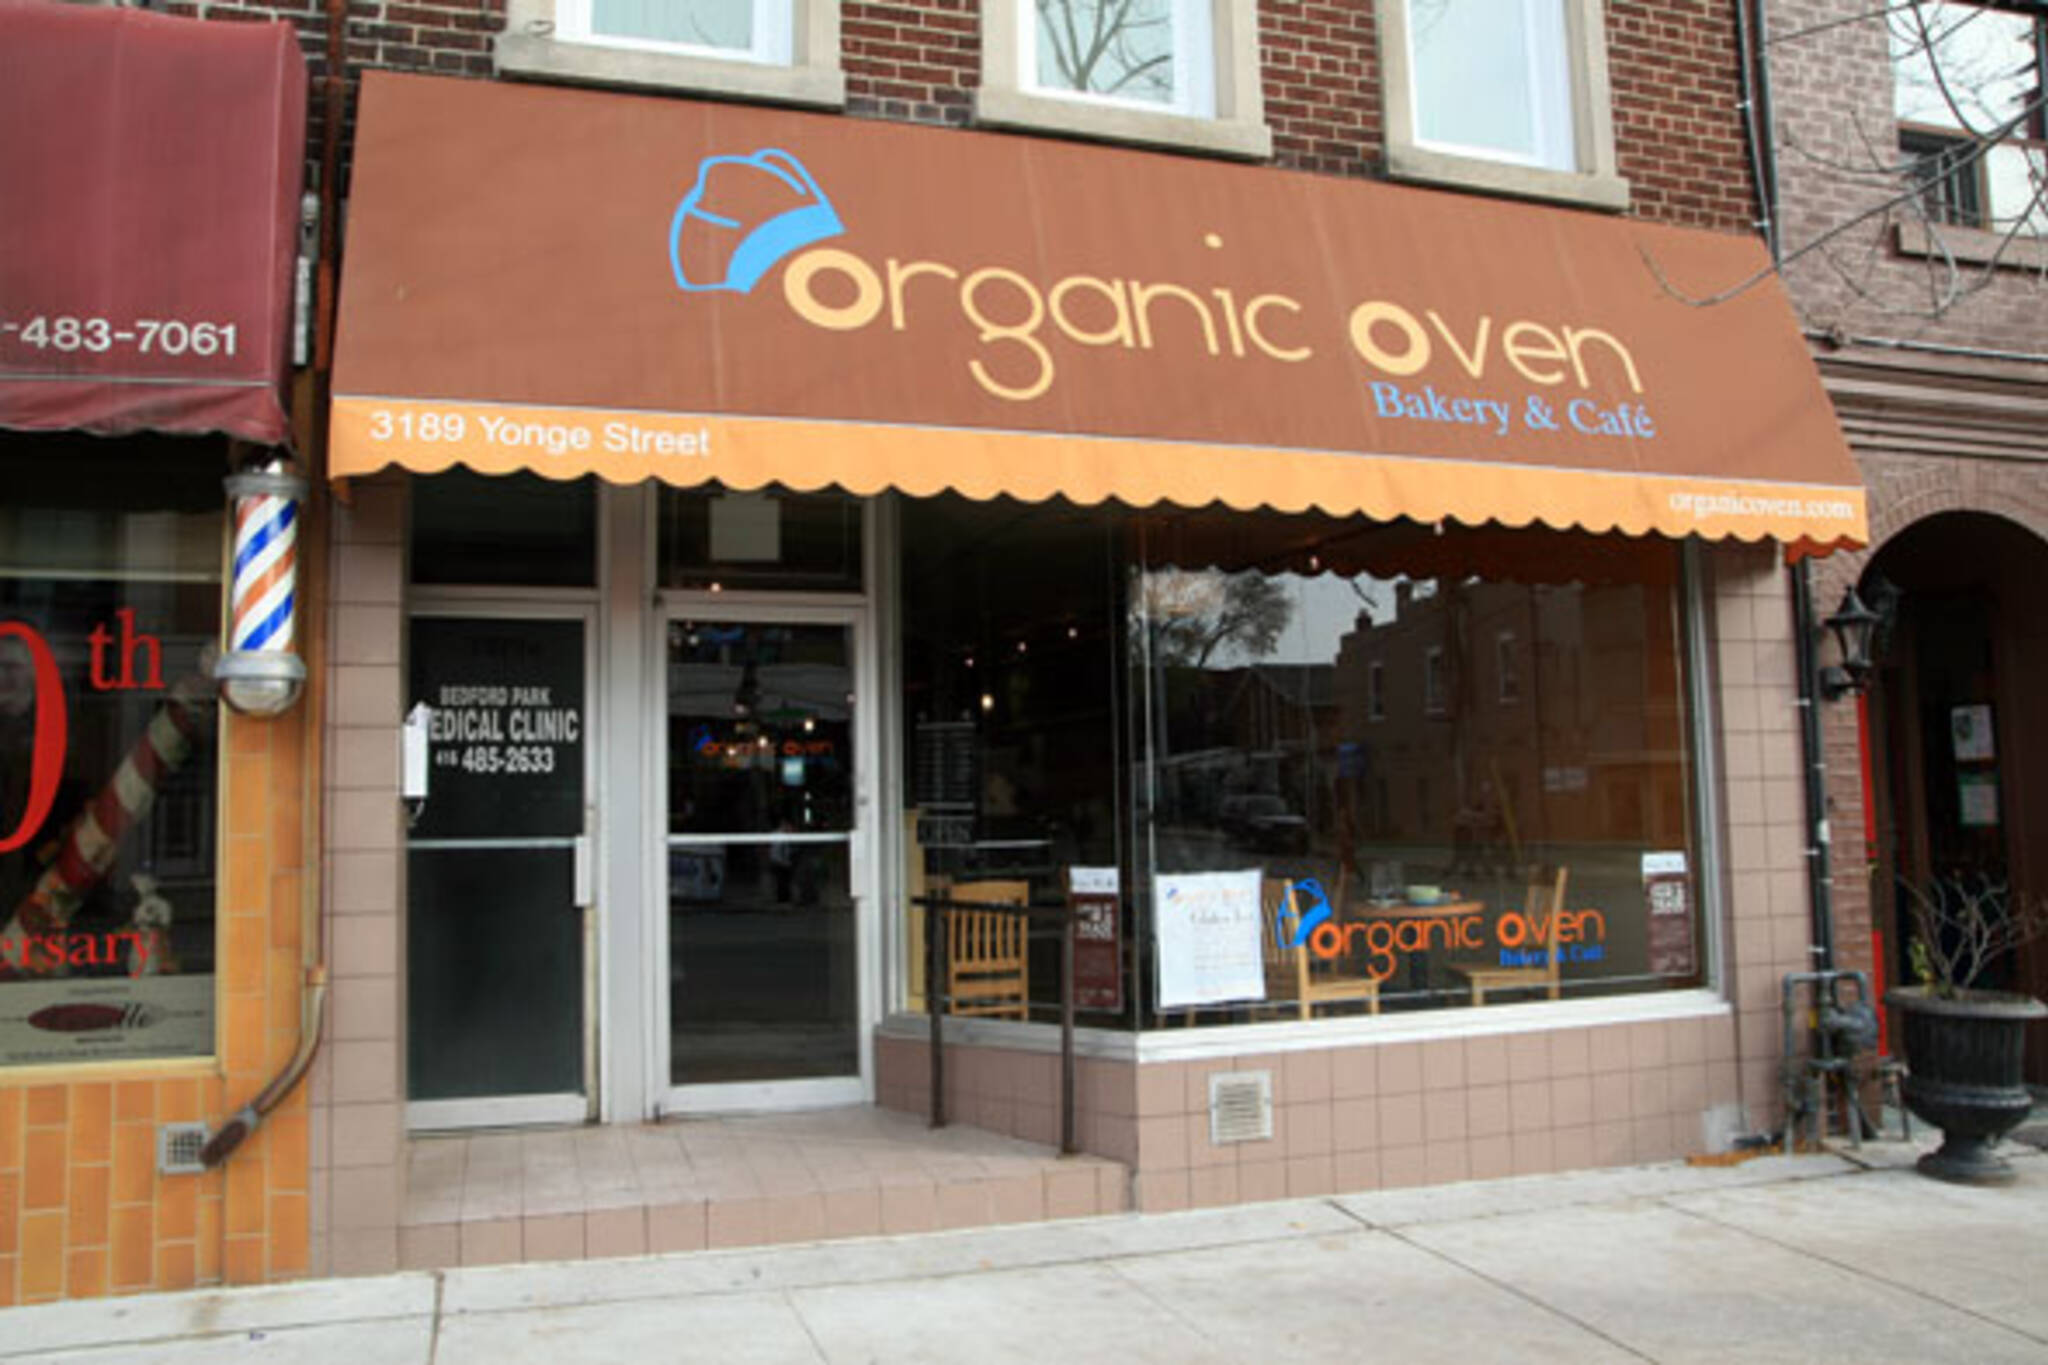 Organic Oven